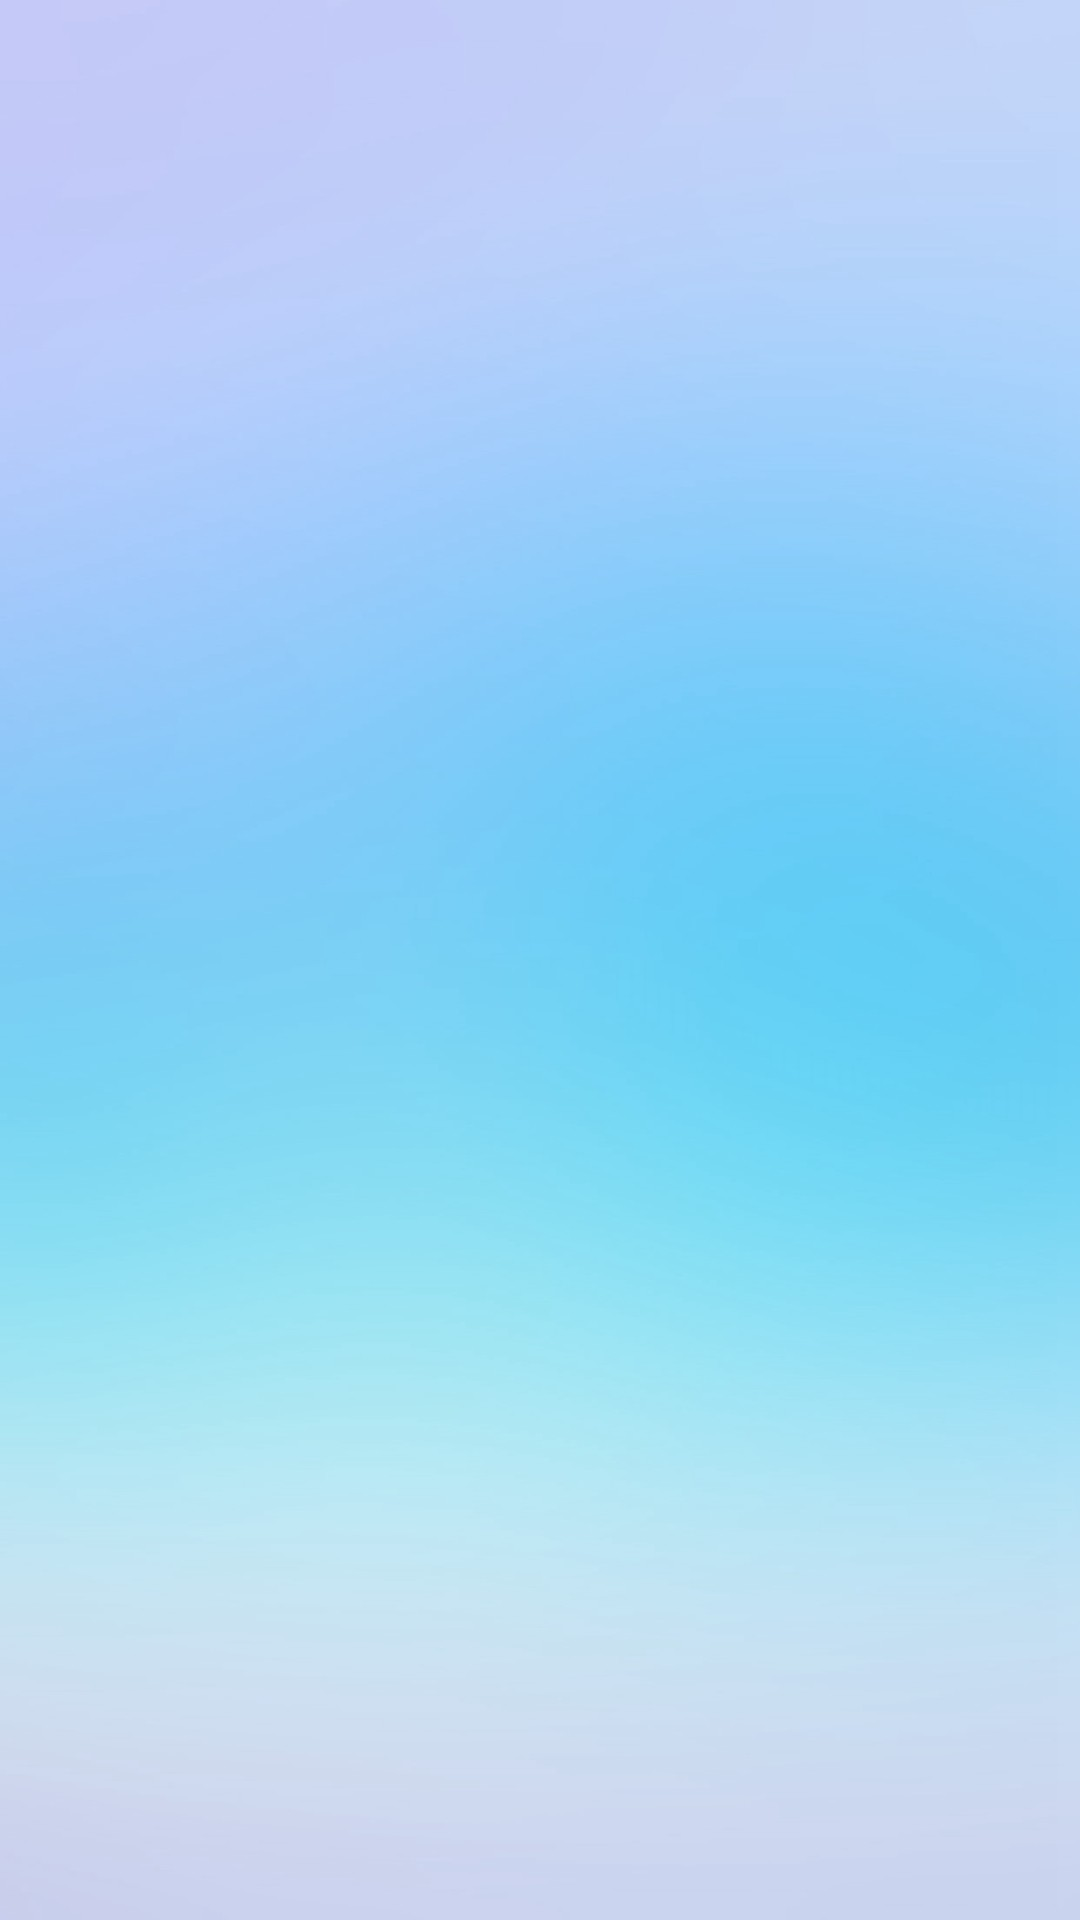 Pastel Blue To Violet Gradation